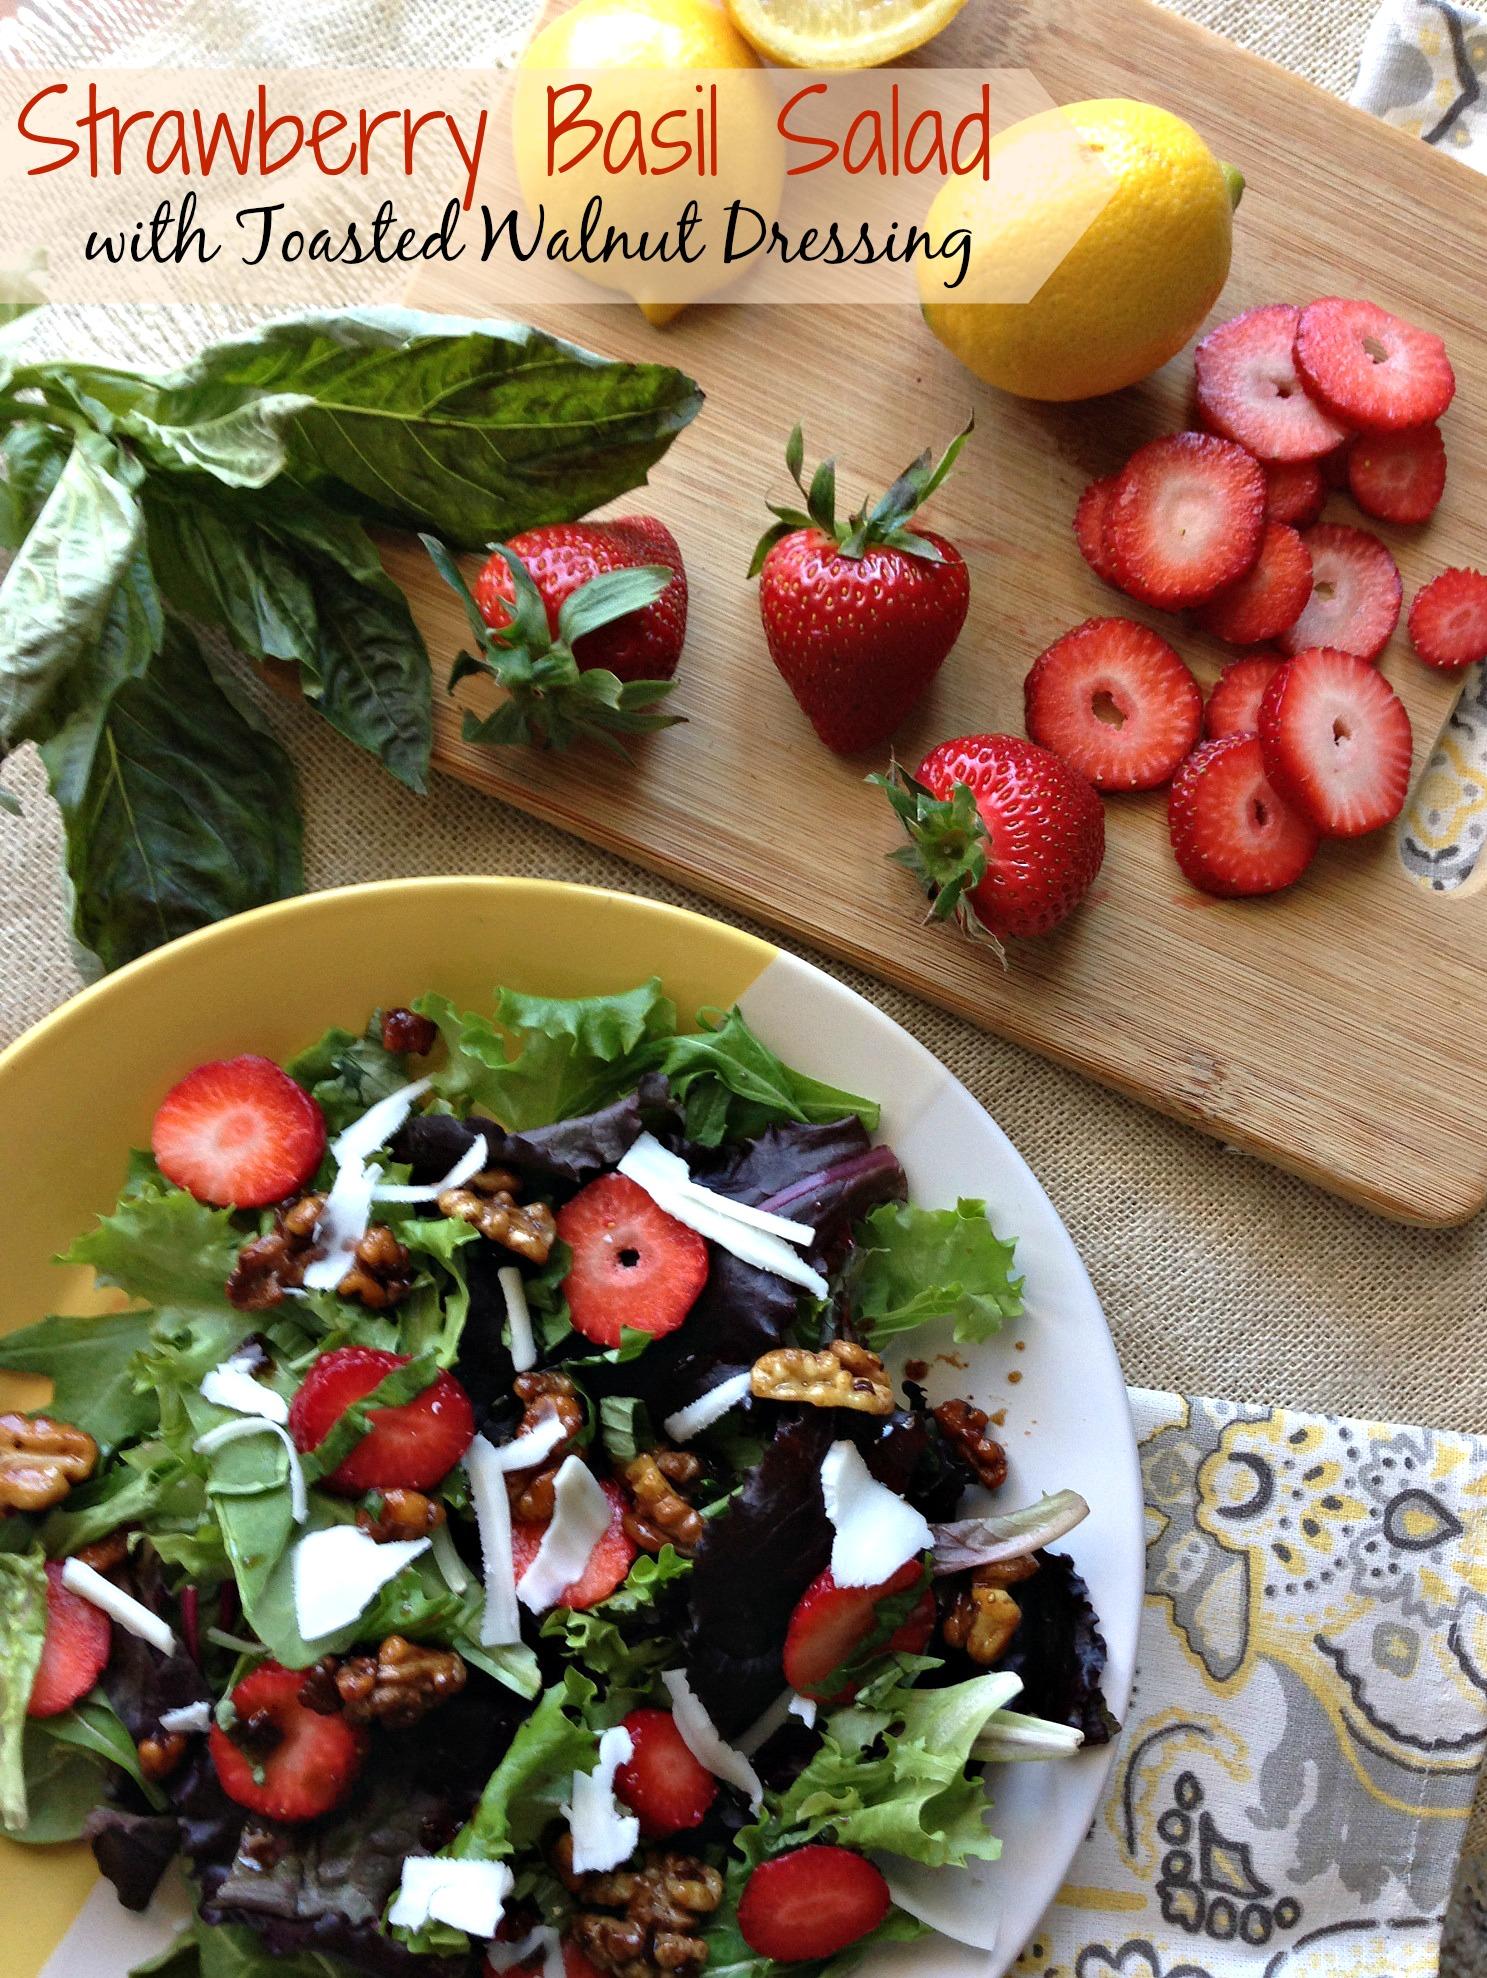 Strawberry Basil Salad with Toasted Walnut Dressing